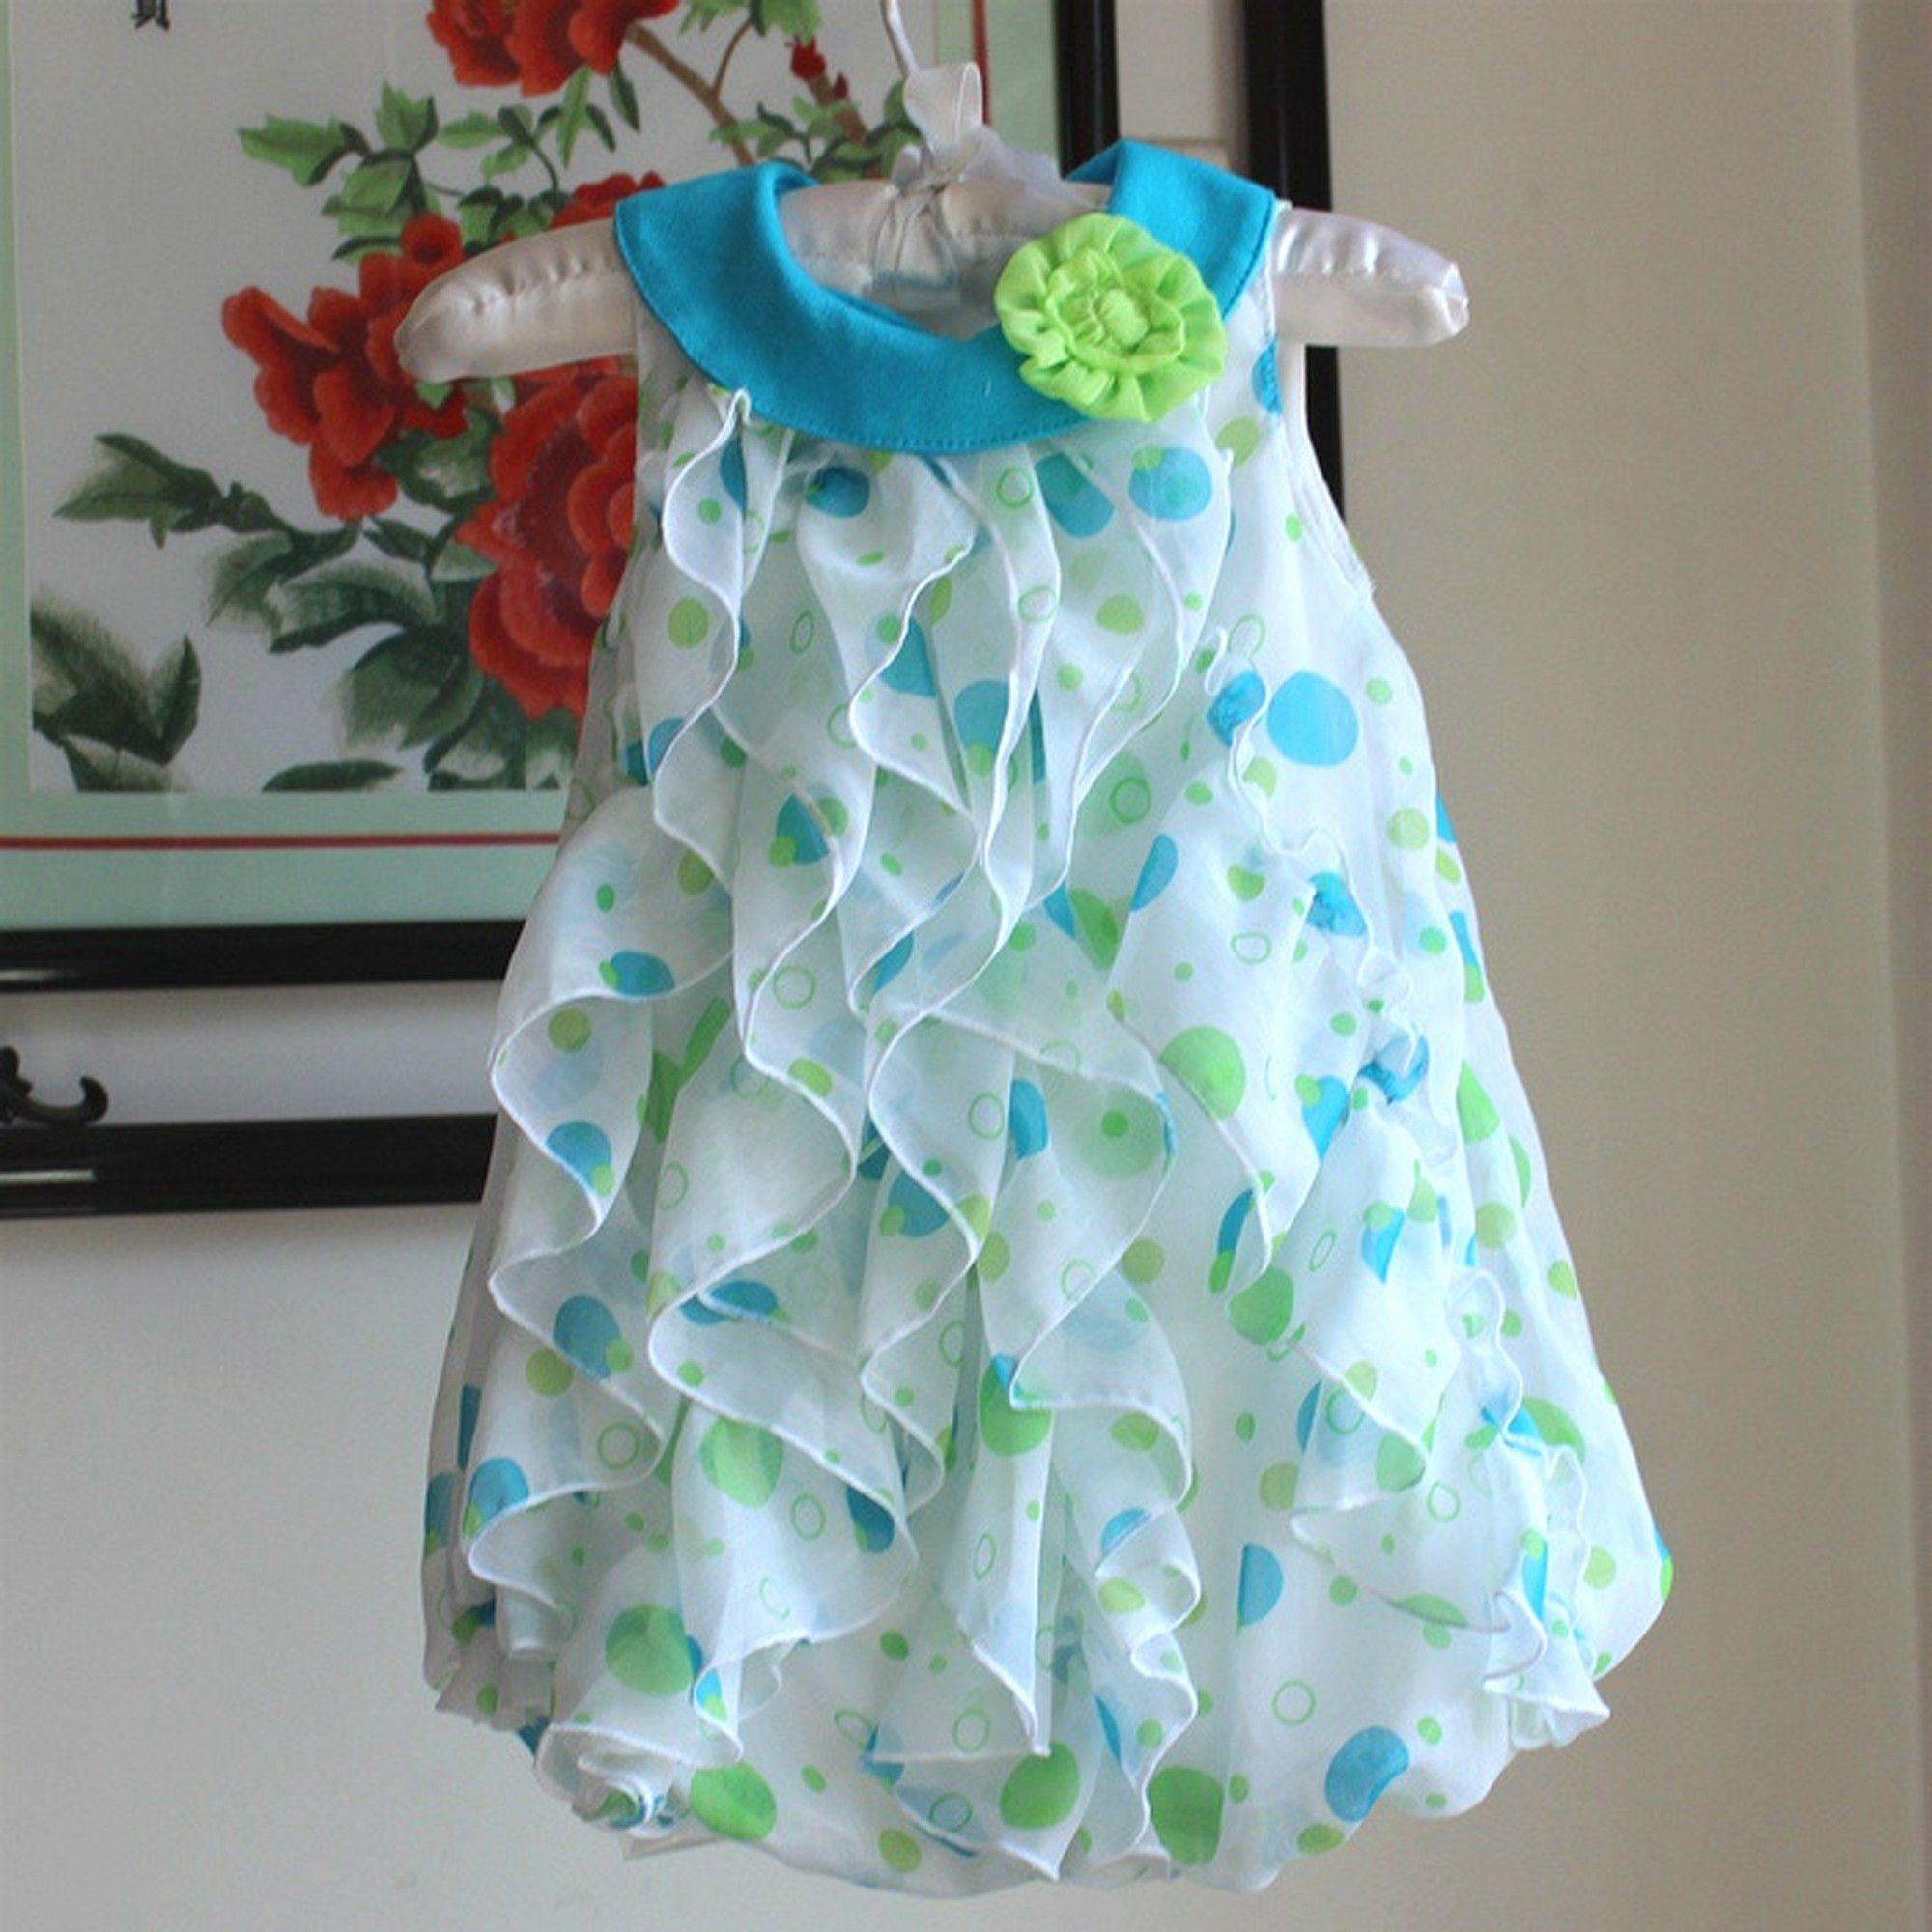 White & Sky Blue Floral Applique Dress - Lil Mantra